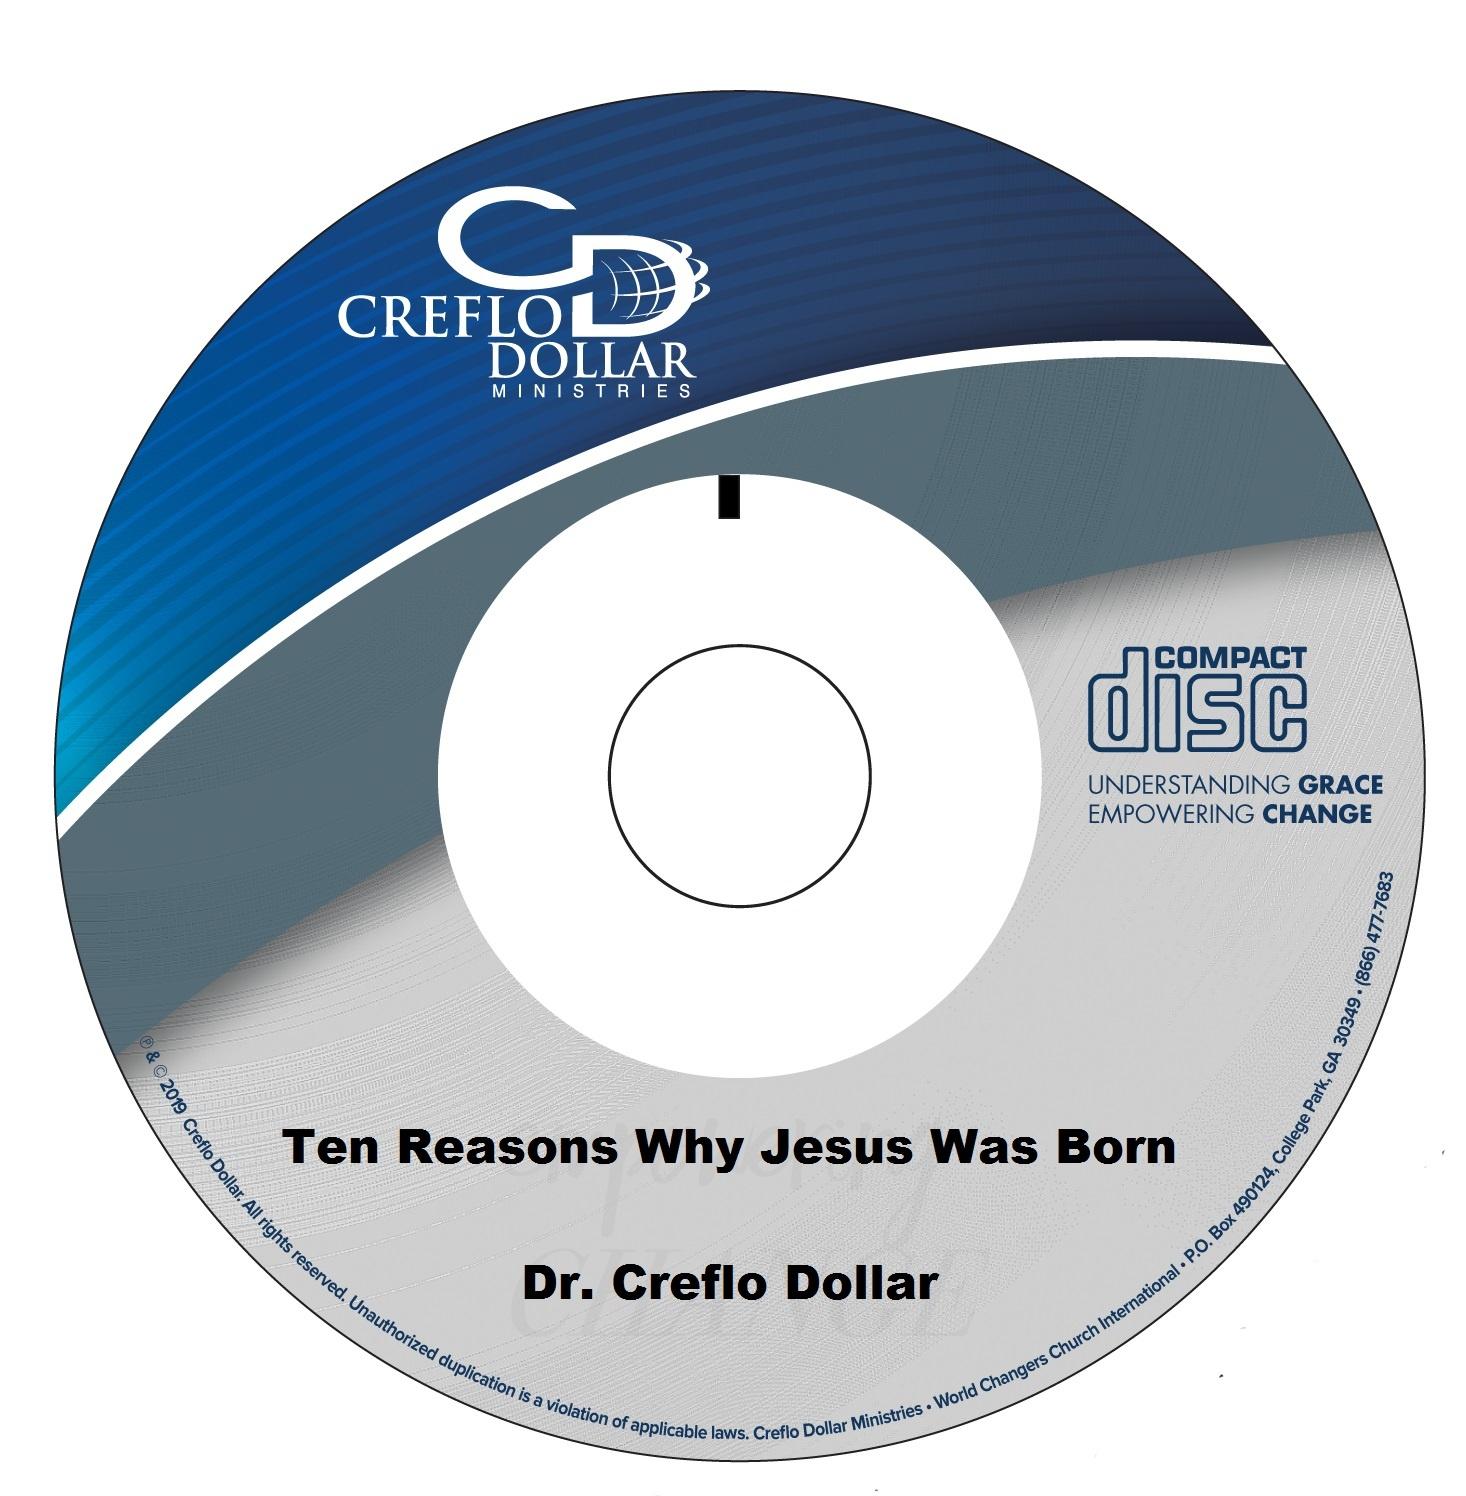 Ten Reasons Why Jesus Was Born - CD Single